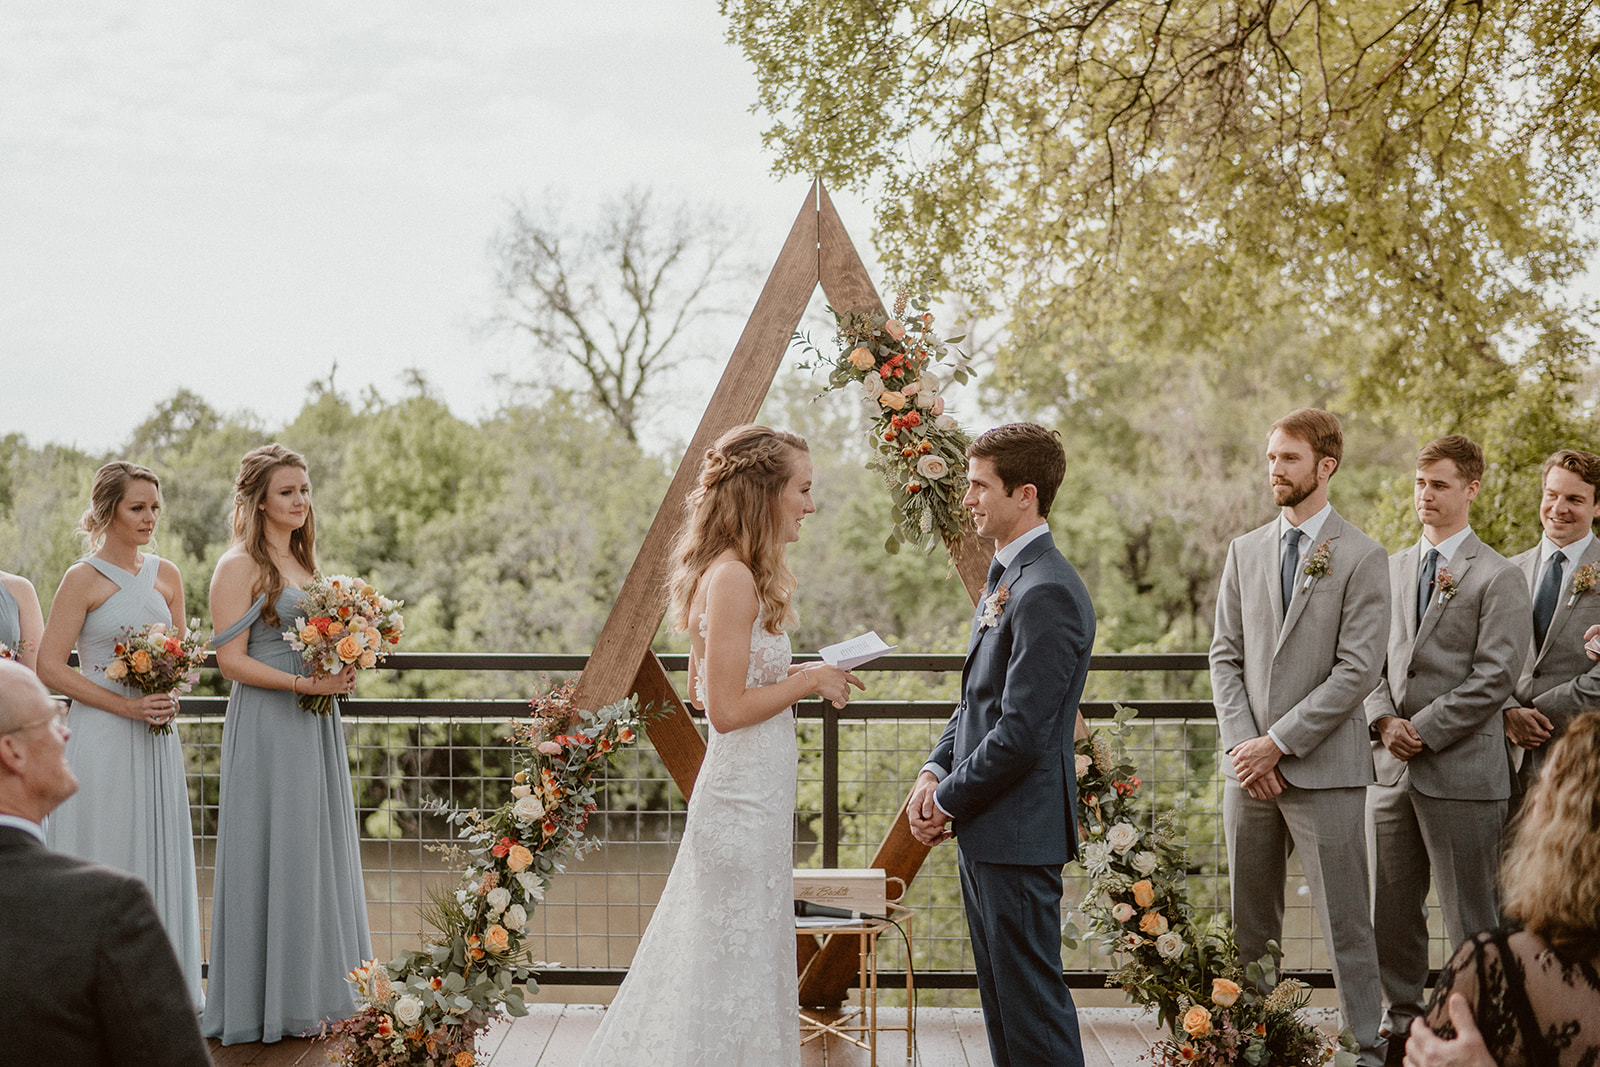 stefanie-chad-wedding-557_websize.jpg